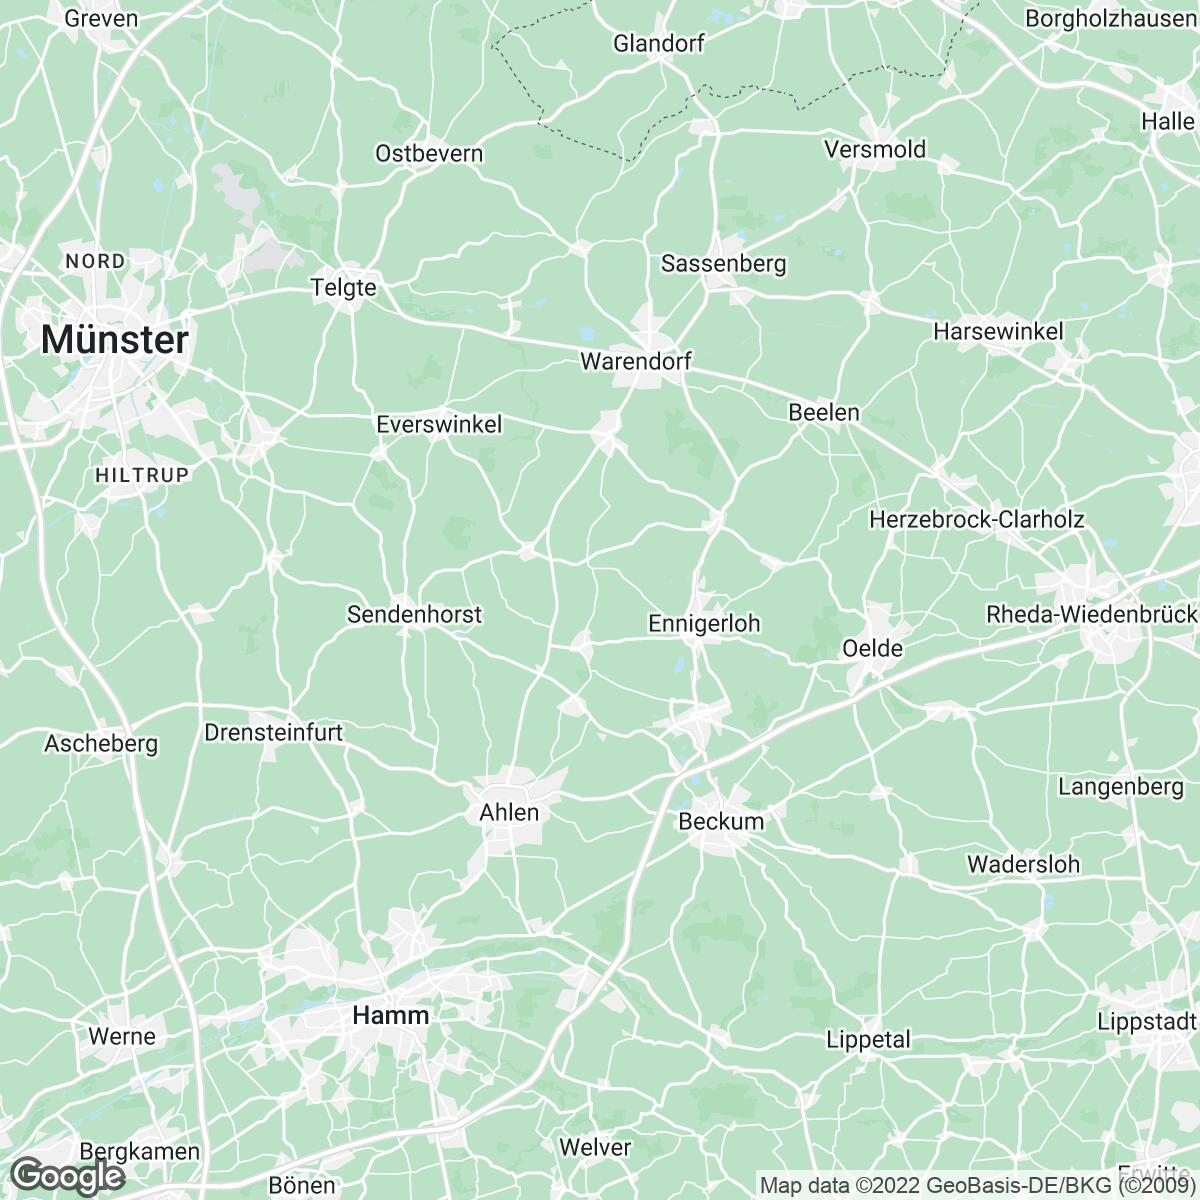 Verkaufsgebiet der Zeitungen ZGM Zeitungsgruppe Münsterland